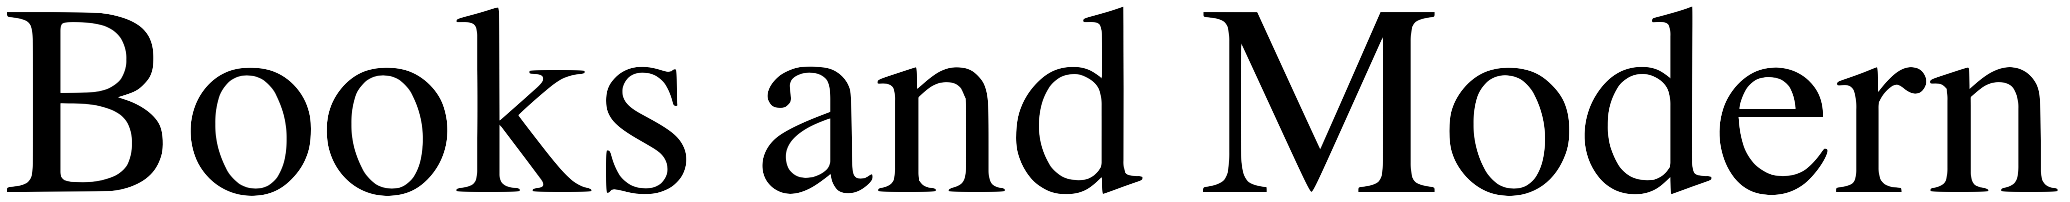 Books and Modern ウェブサイトロゴ